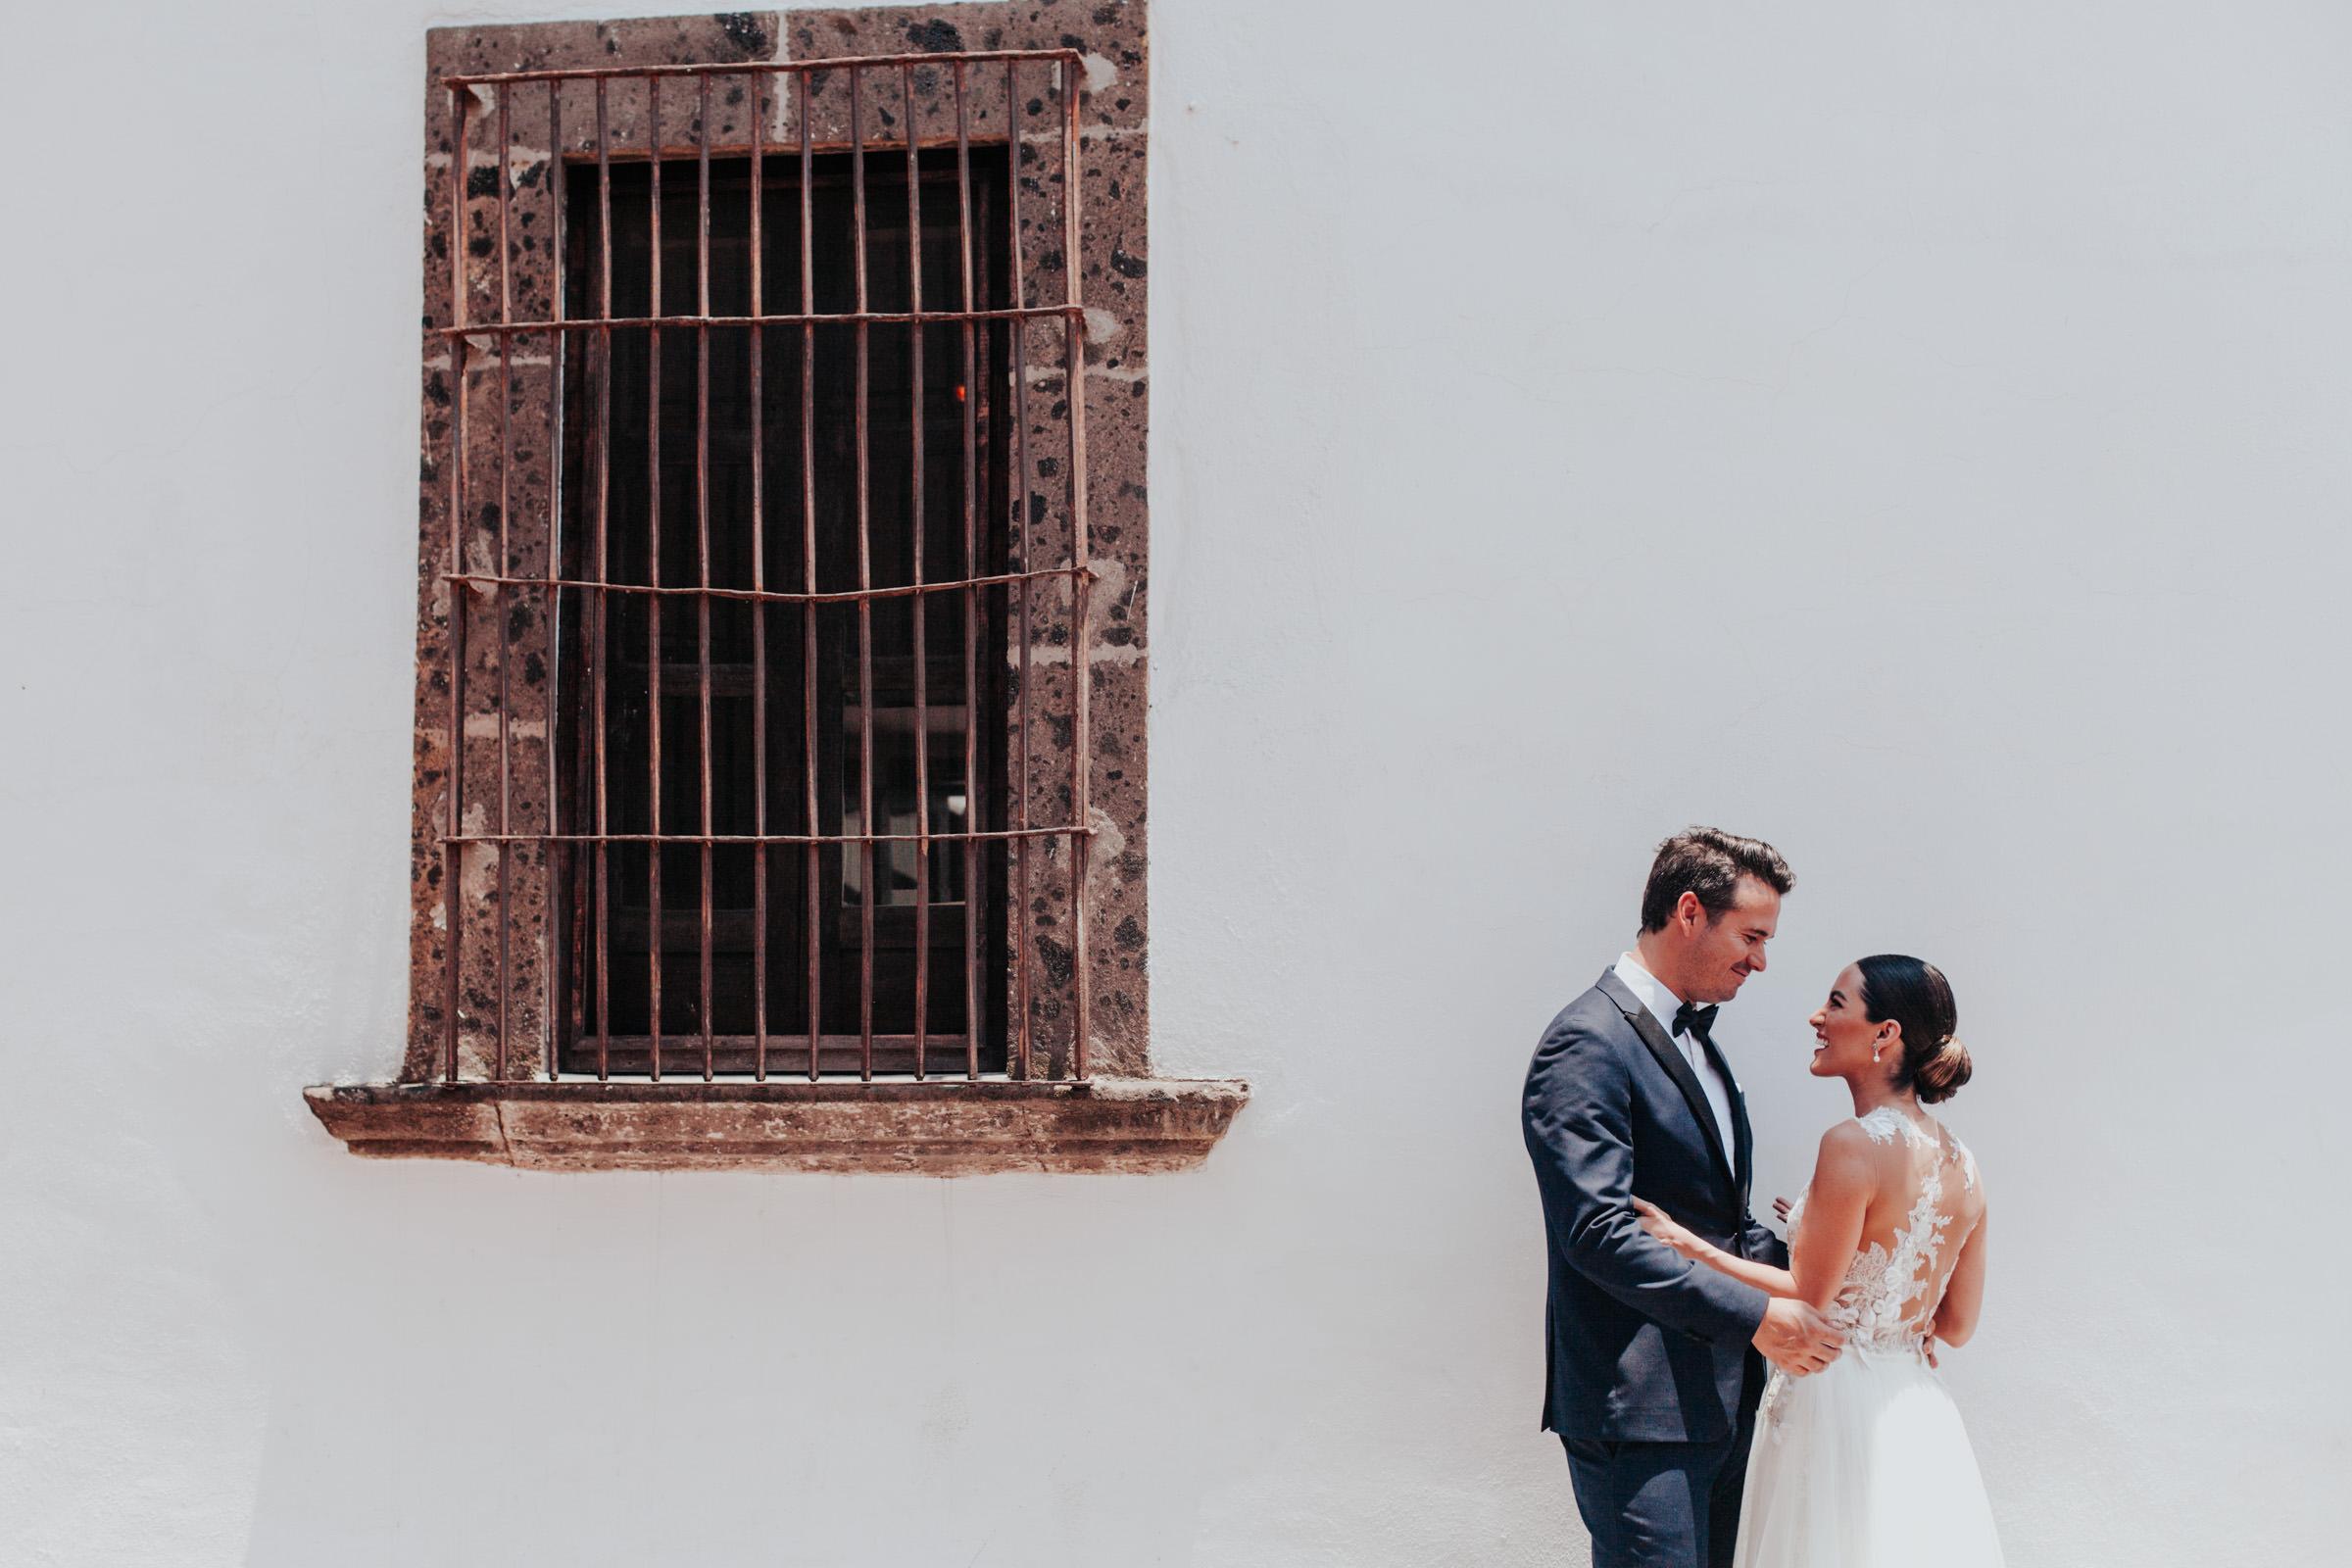 San-Miguel-de-Allende-Wedding-Photography-Parroquia-Instituto-Boda-Fotografia-Fer-Sergio-Pierce-Lifestyle-Photography0239.JPG